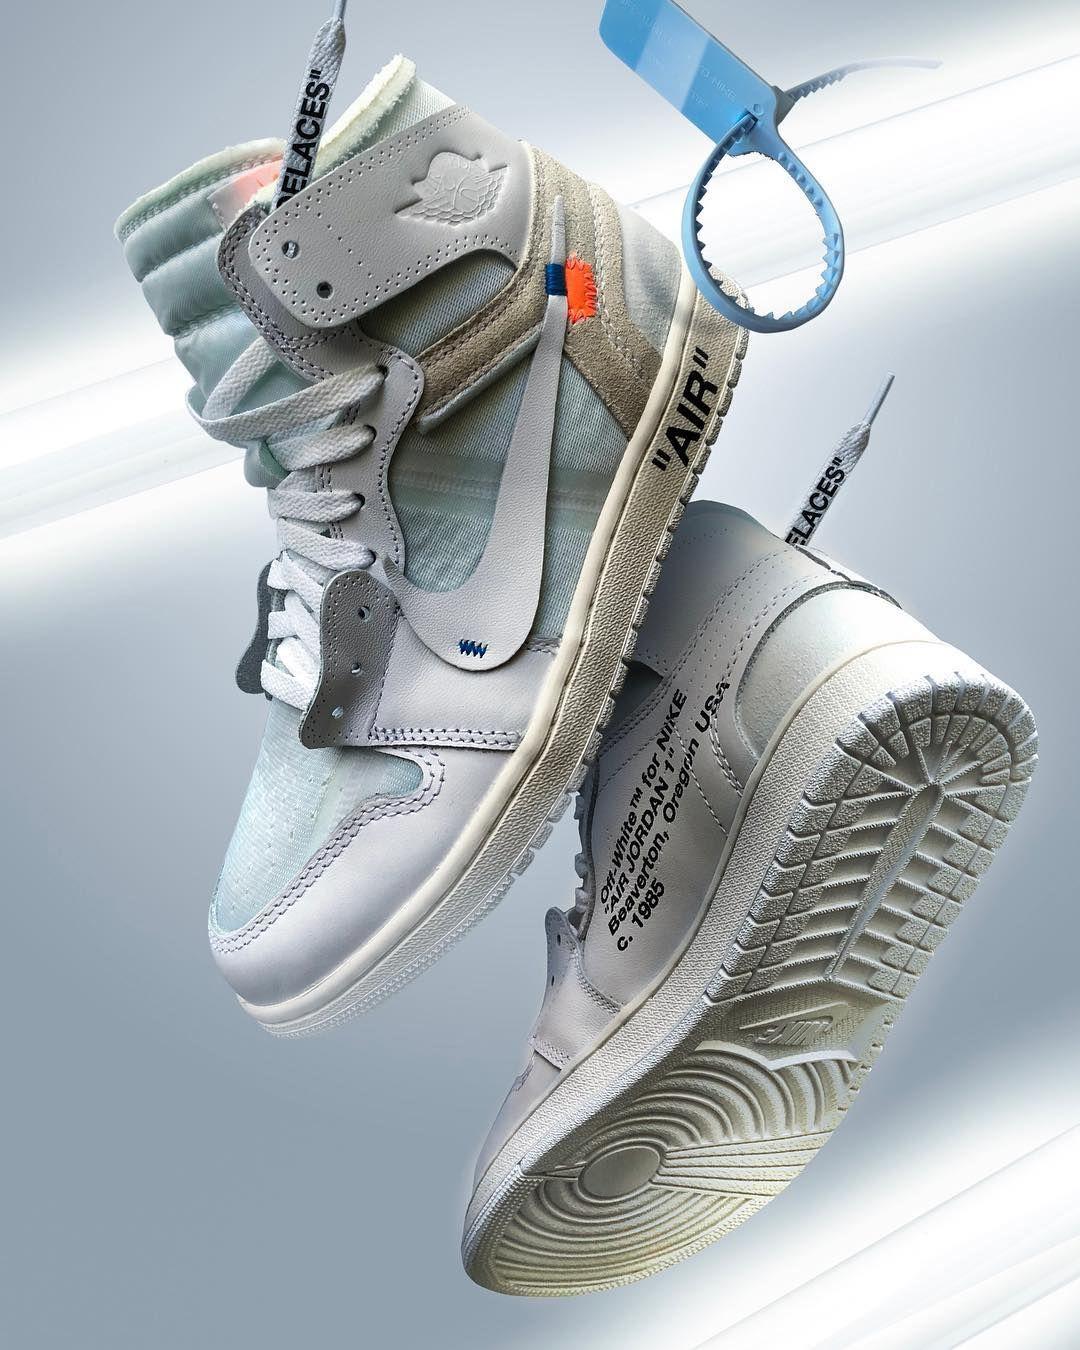 Off White X Nike Jordan 1 Hype Shoes Sneakers Men Fashion Sneakers Nike Jordan